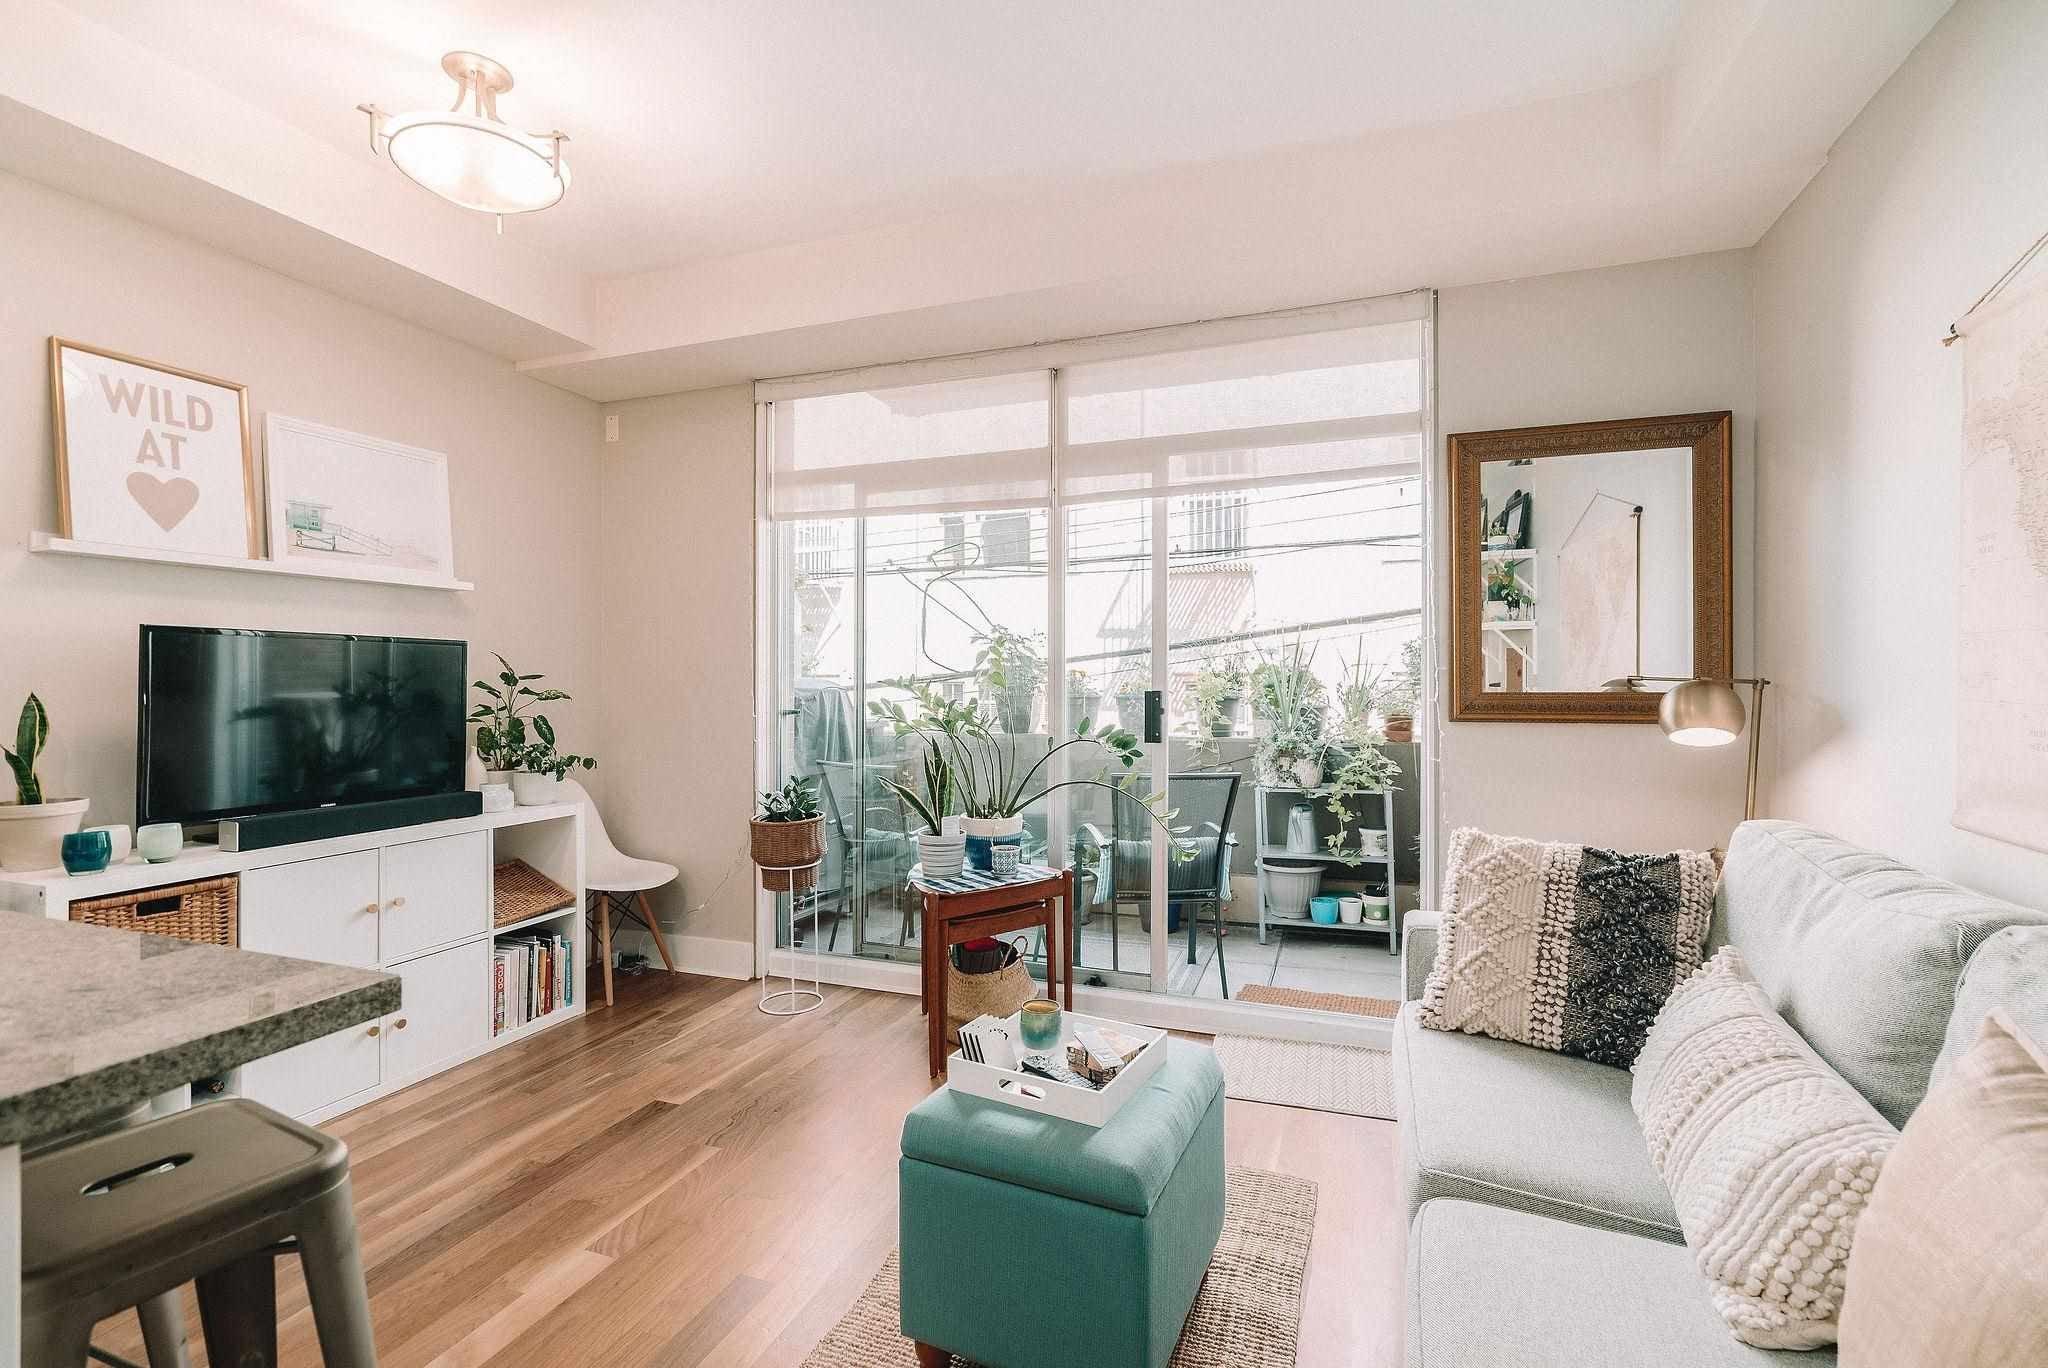 211 1477 W 15TH AVENUE - Fairview VW Apartment/Condo for sale, 1 Bedroom (R2605285)